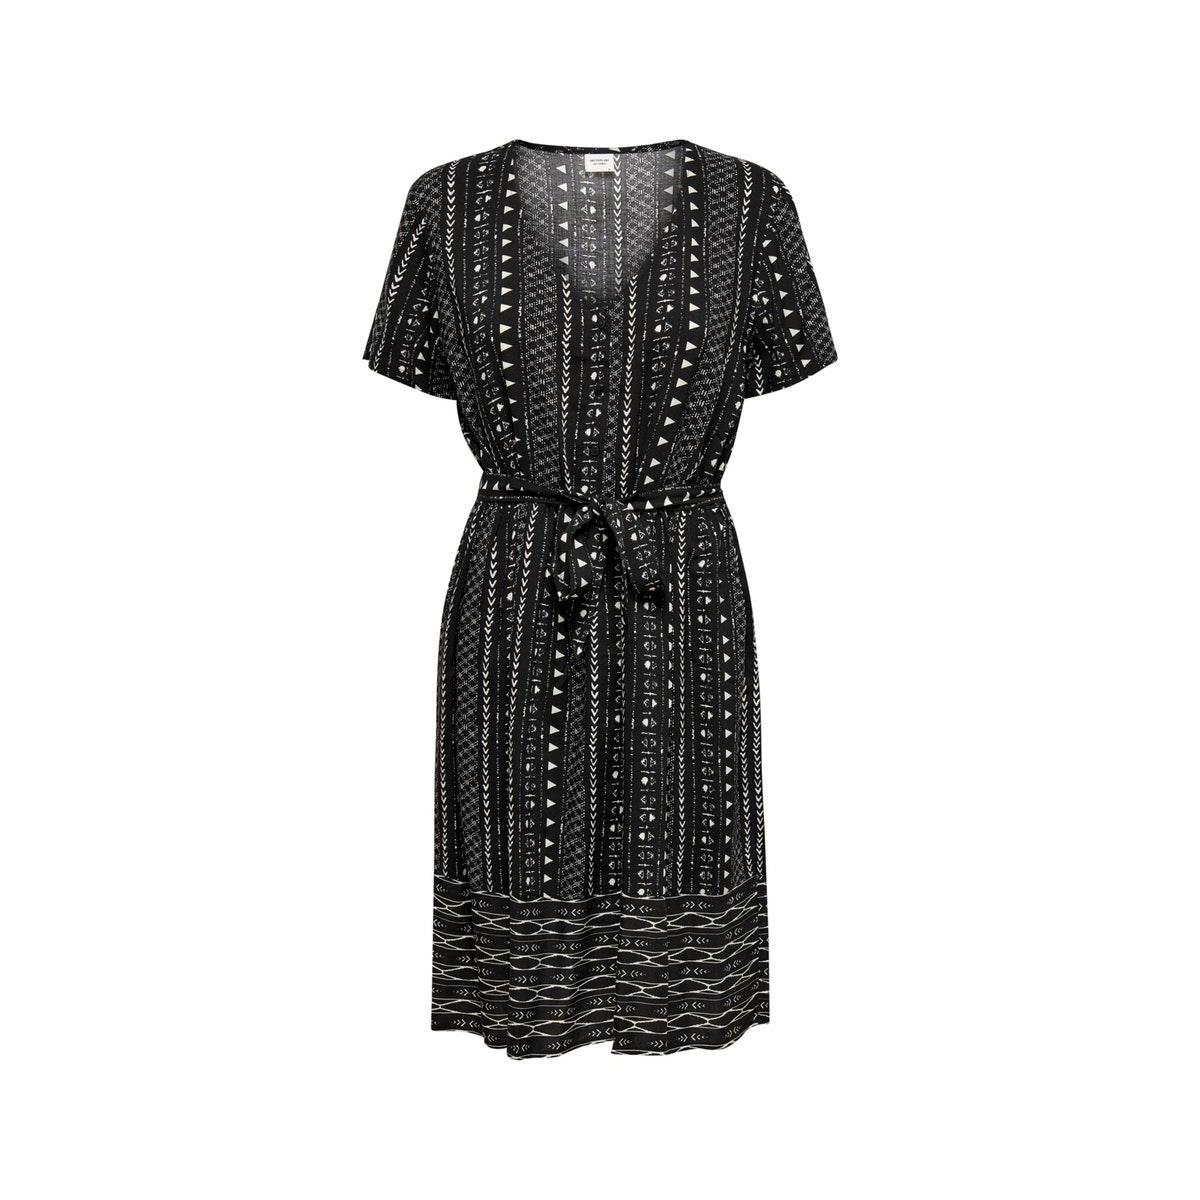 jdytiffany s/s dress wvn 15201668 jacqueline de yong jurk black/sandshell